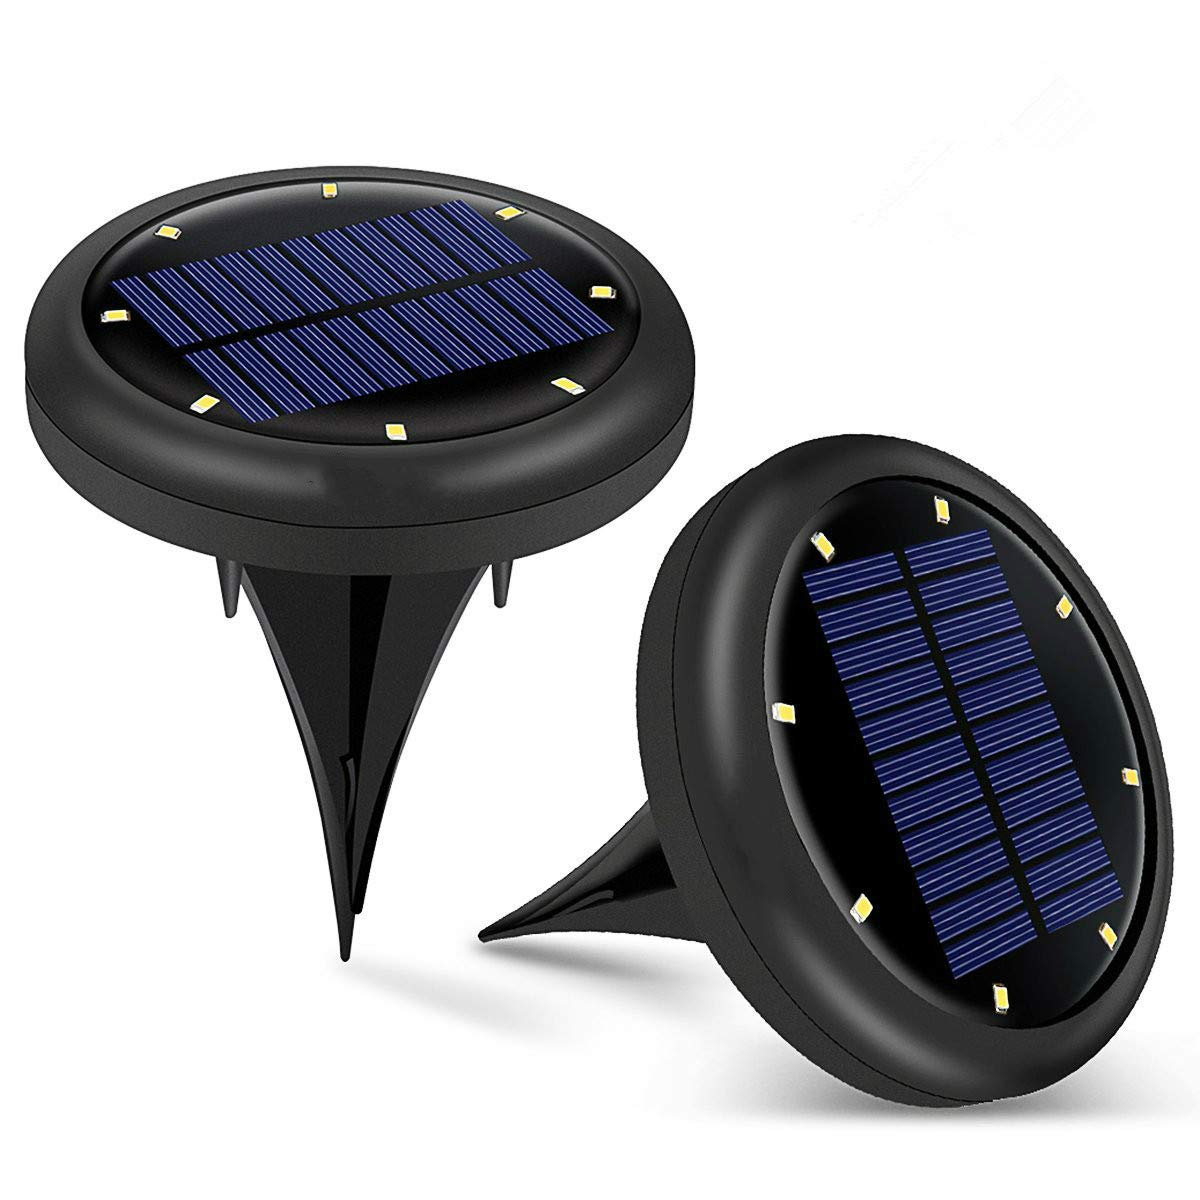 Solar Ground Lights Outdoor, 8 LED Waterproof Sensor Lawn Light Landscape Powered Light for Backyard, Garden, Pathway